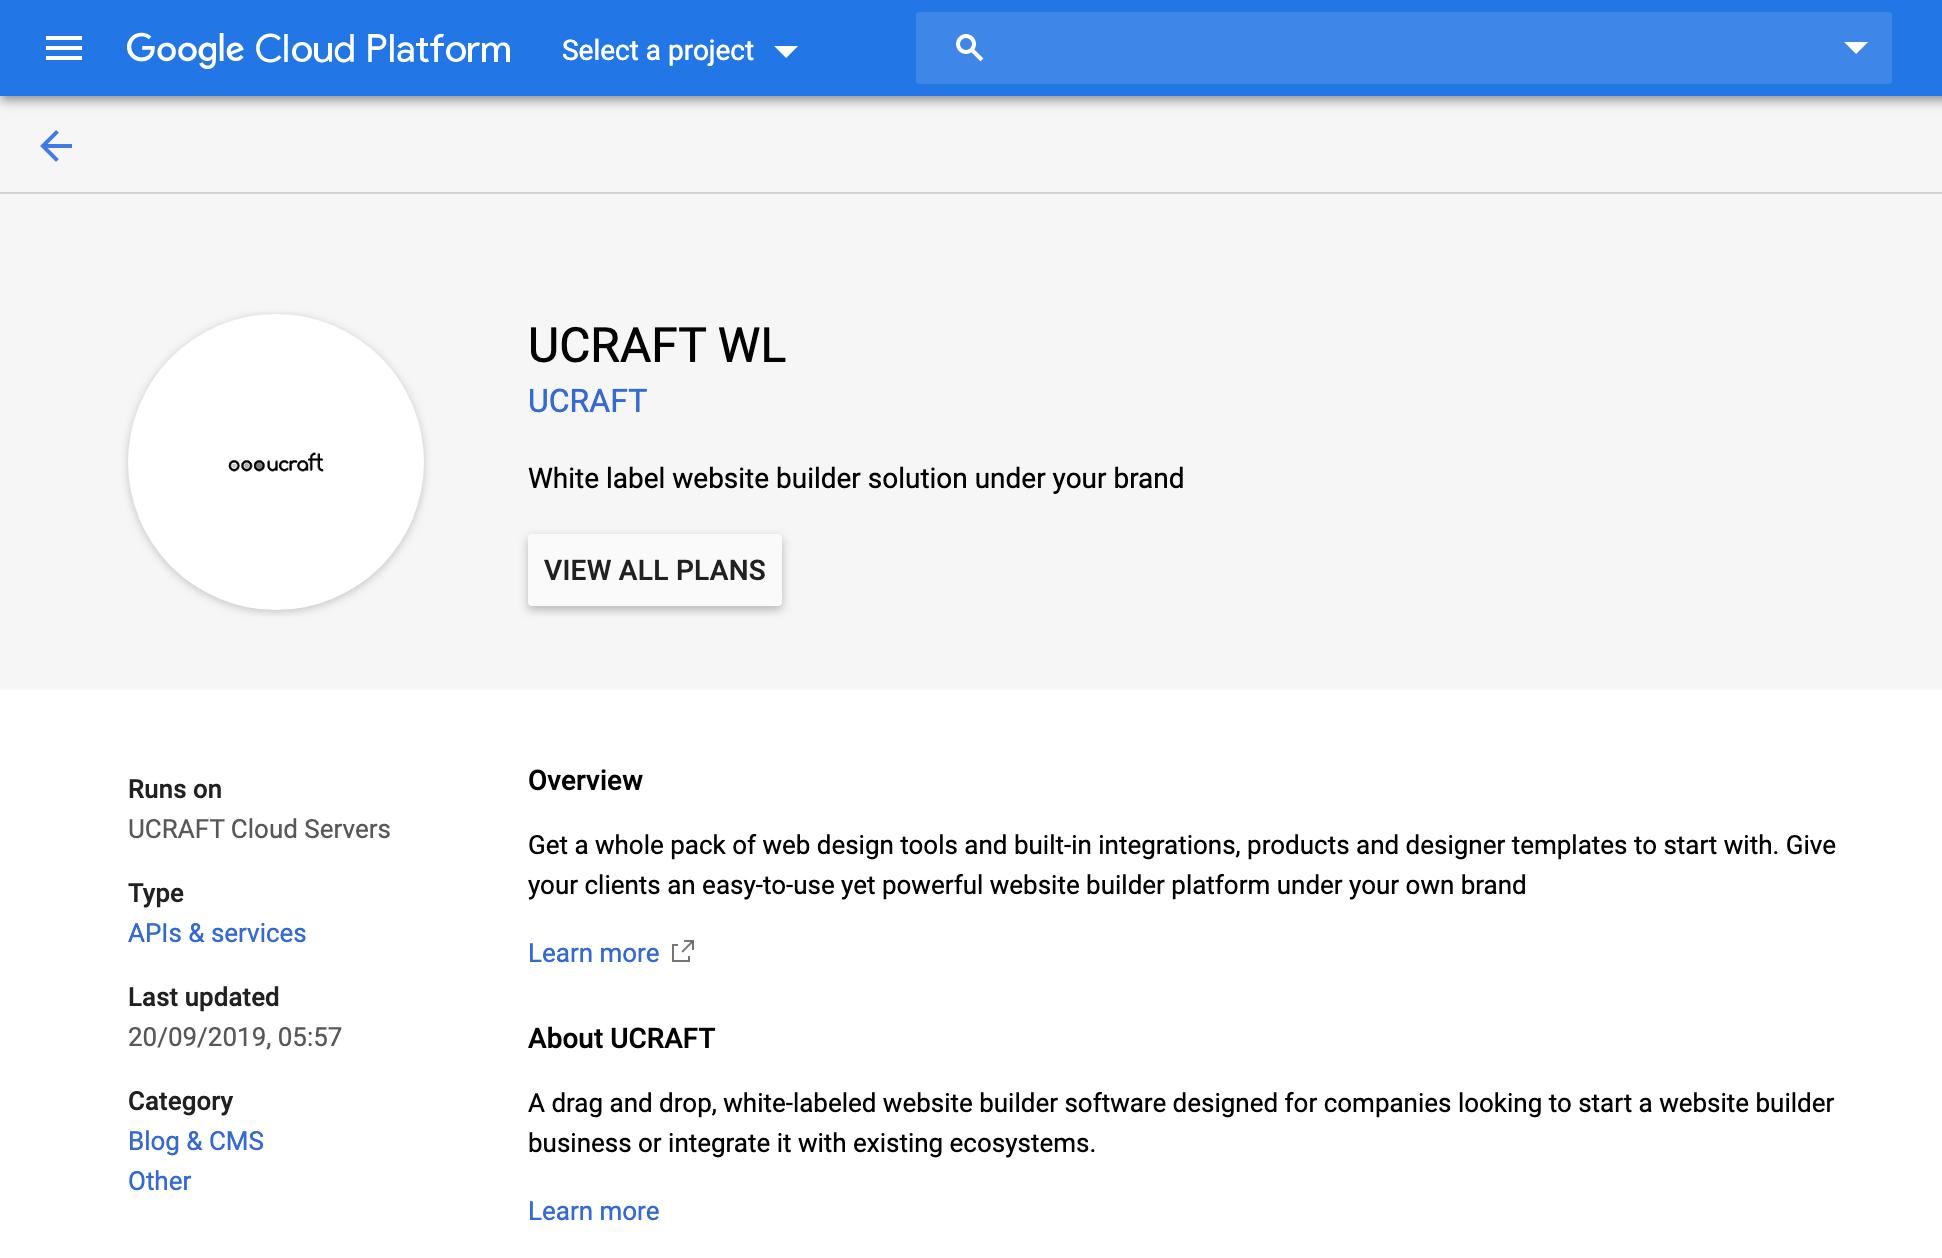 ucraft-ը google հարթակում